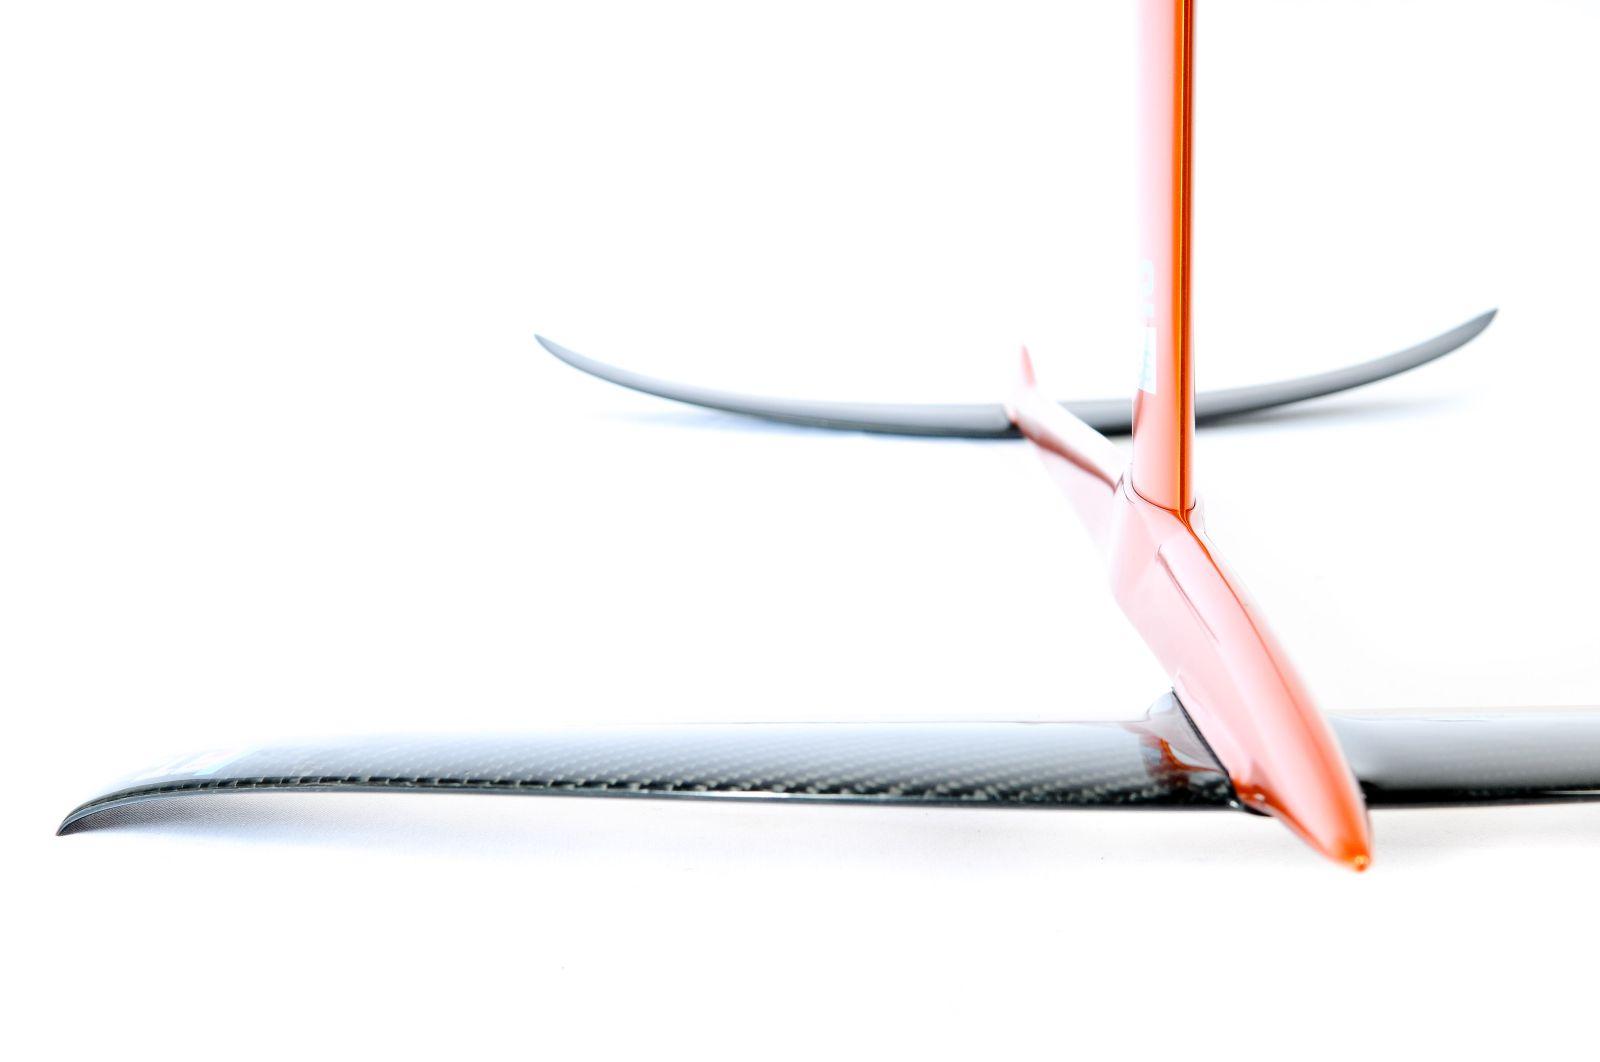 Kitefoil carbon aluminium alpinefoil 5 0 access v2 2491 1